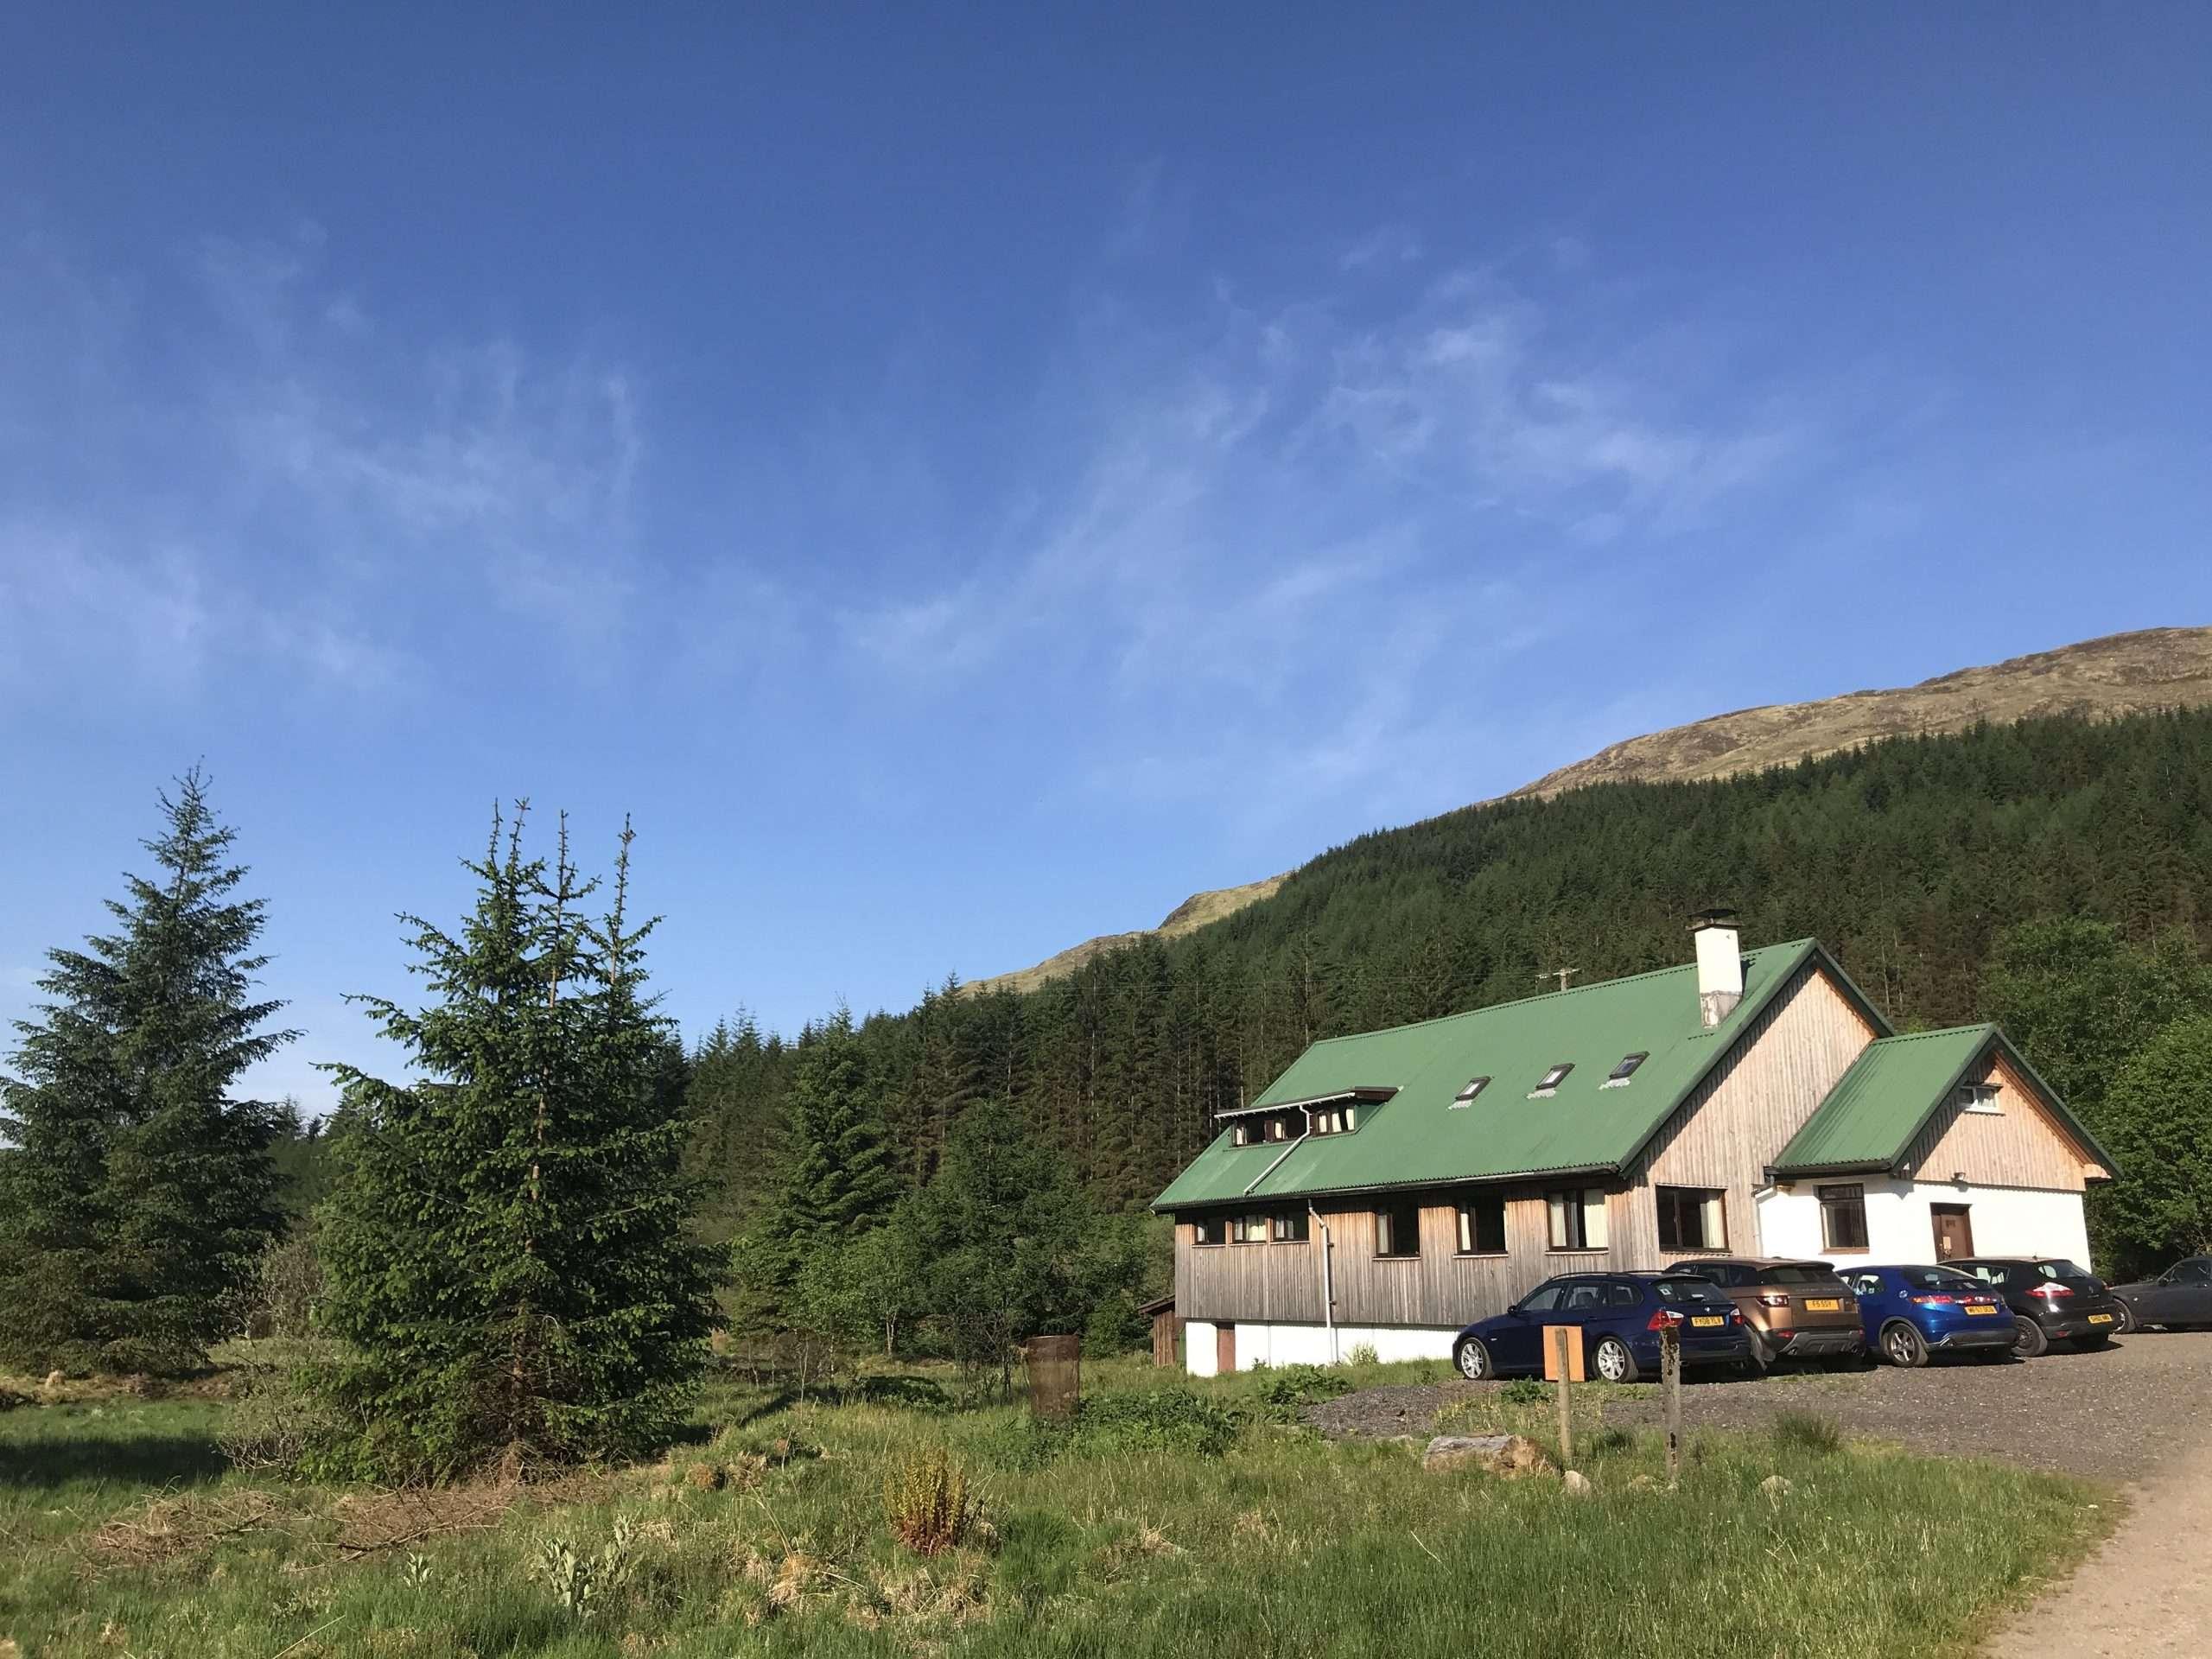 Bridge of Orchy Ski Lodge